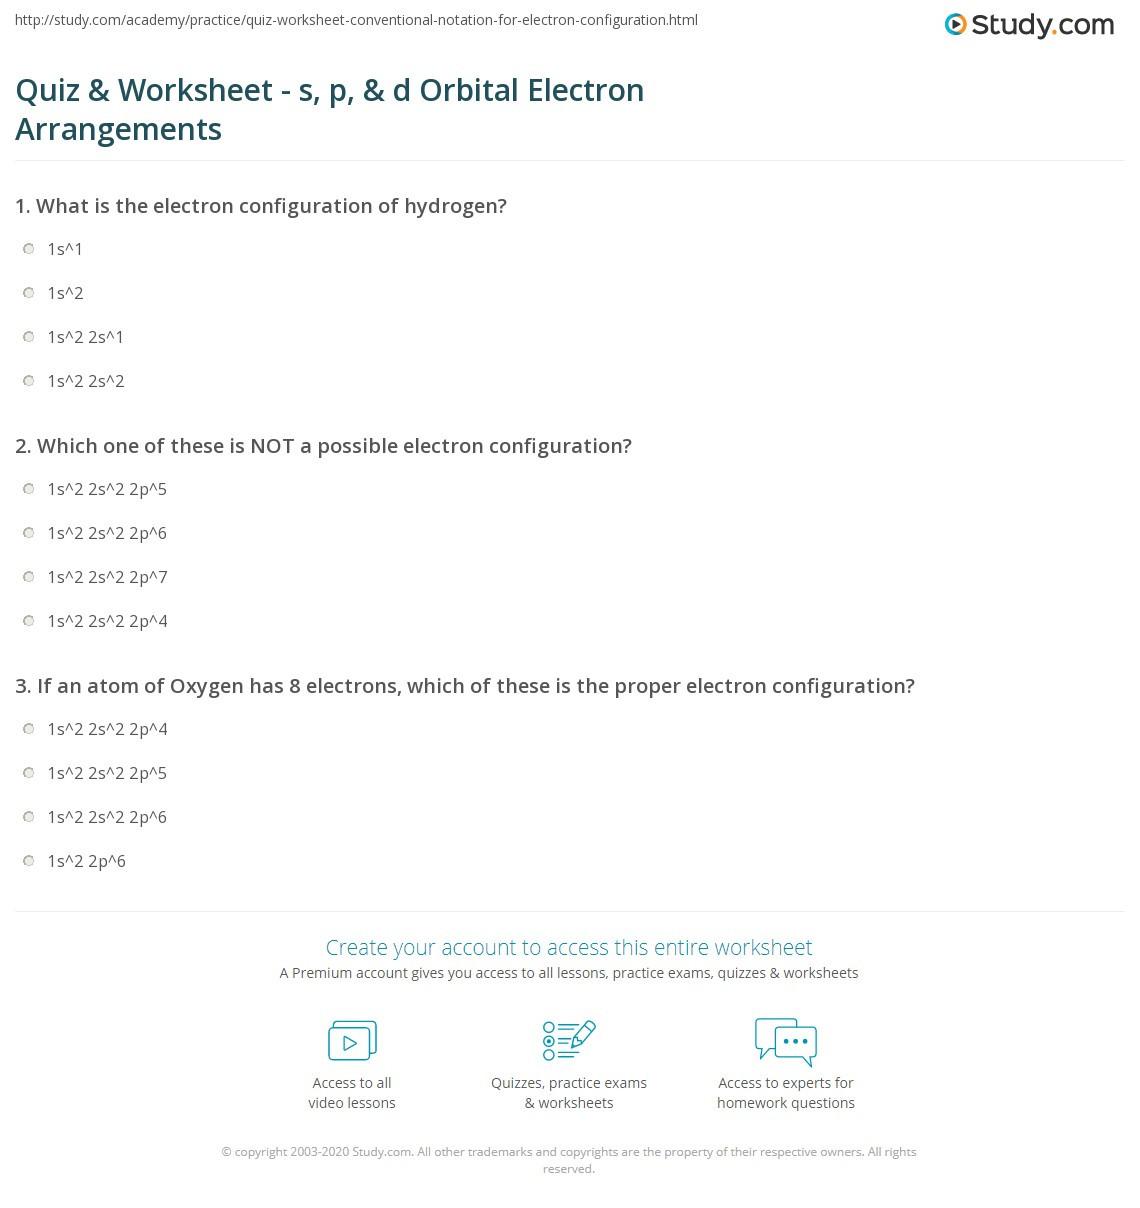 Electron Configuration Practice Worksheet Quiz & Worksheet S P & D orbital Electron Arrangements